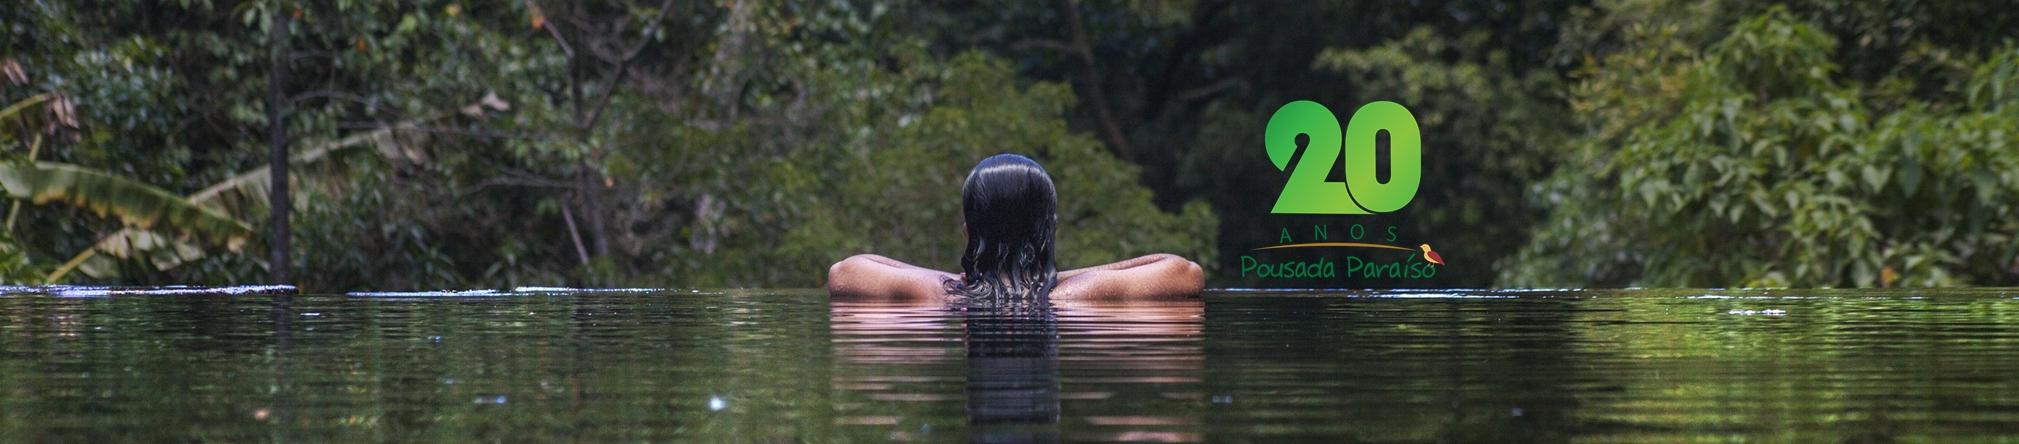 paraiso 57 mari piscina (2)